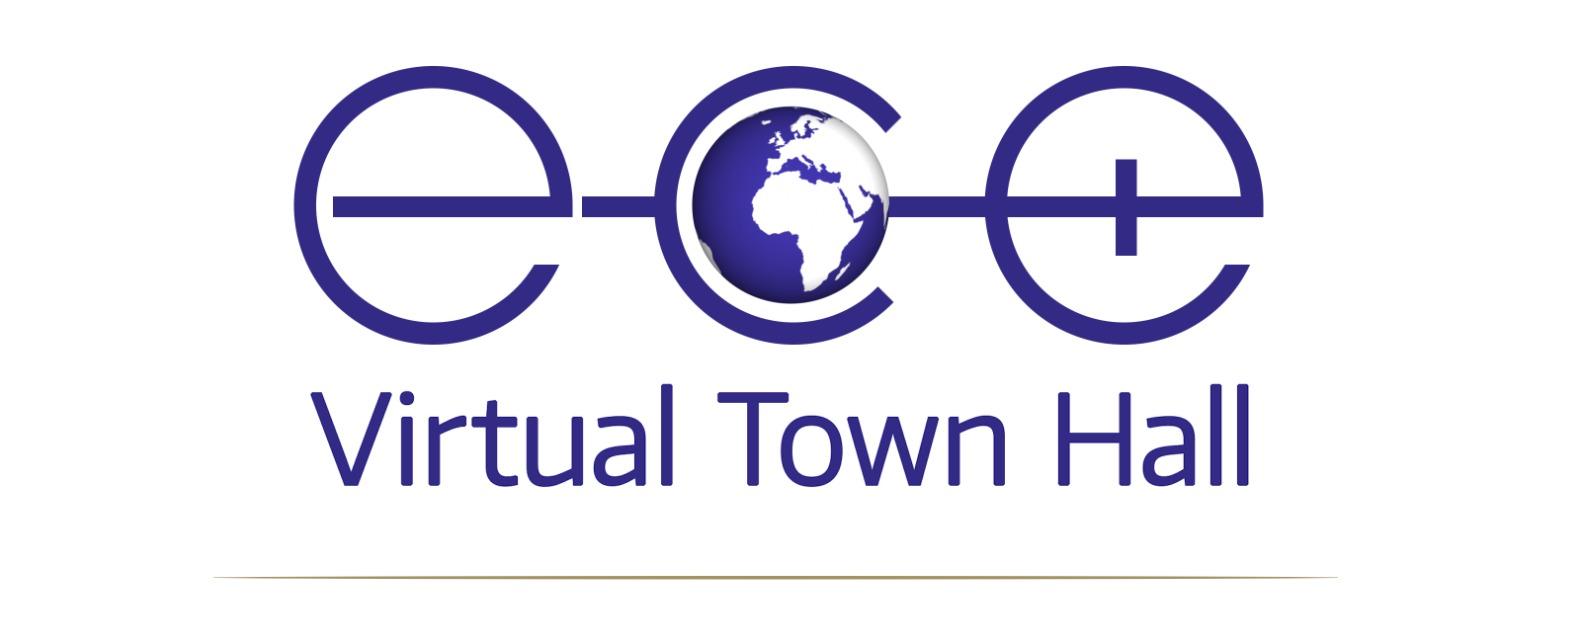 UW ECE Virtual Town Hall - Startup Spotlight